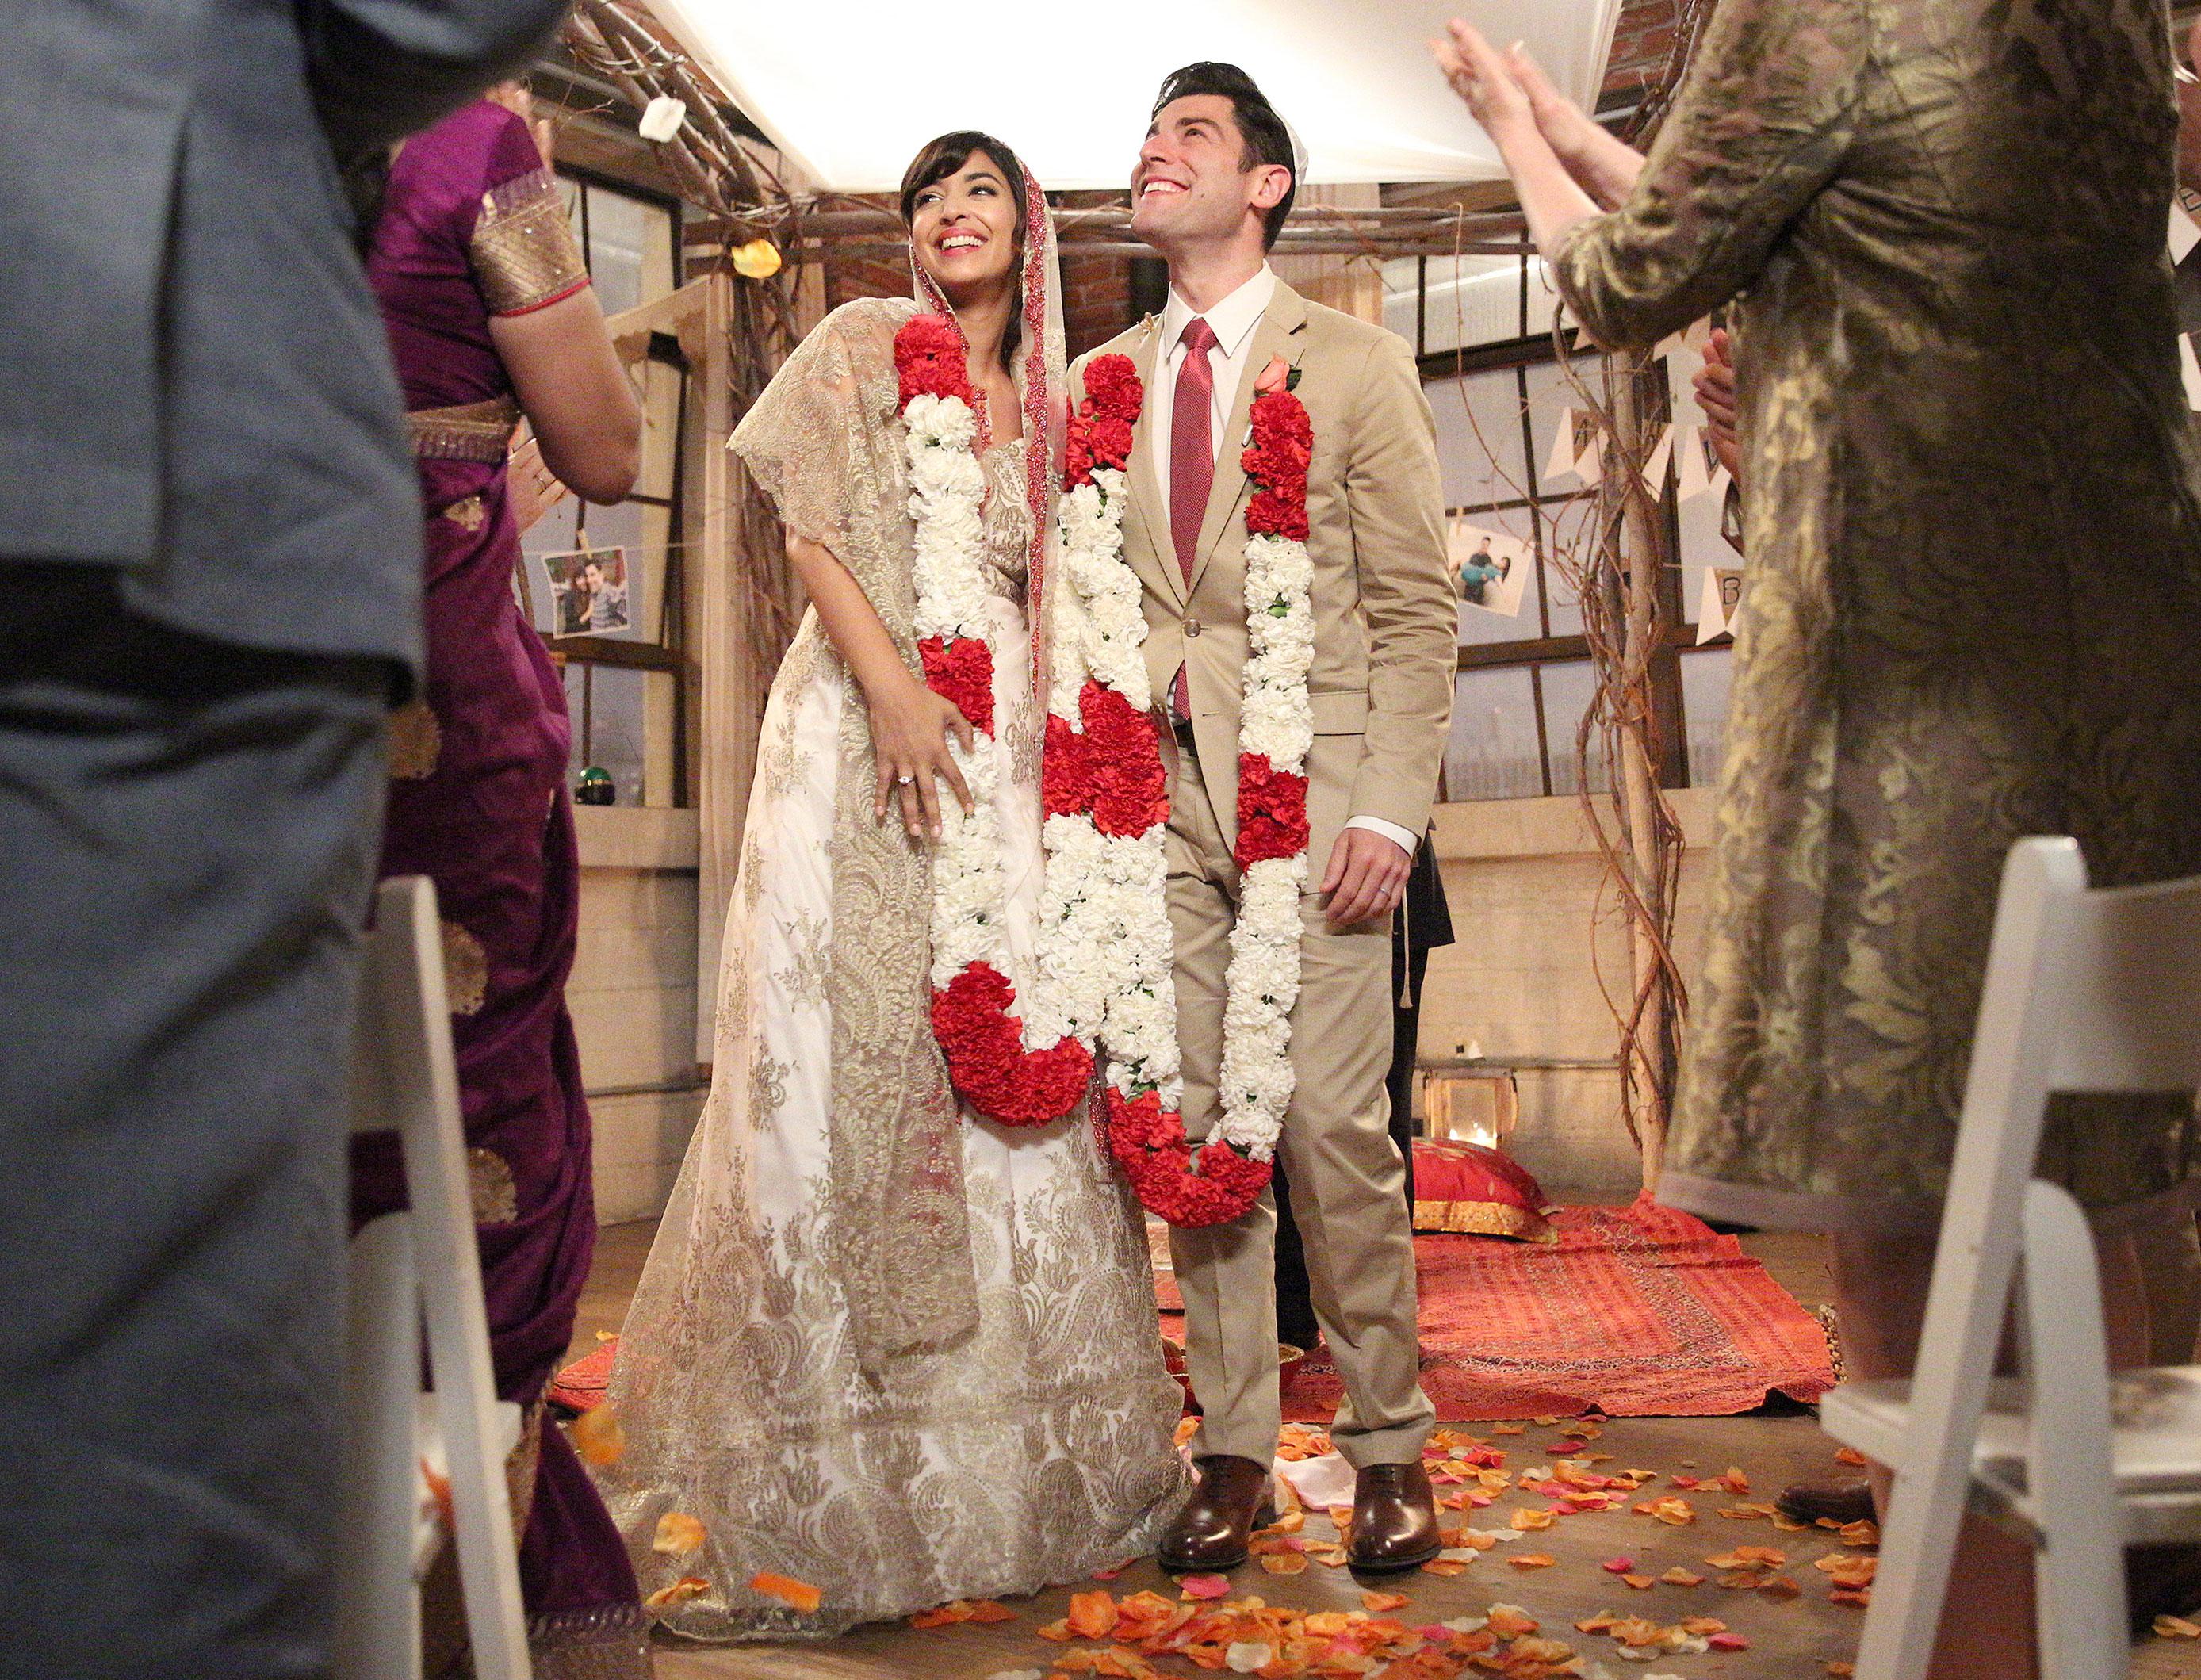 Cece and Schmidt Marry on \'New Girl\': Wedding Dress Details